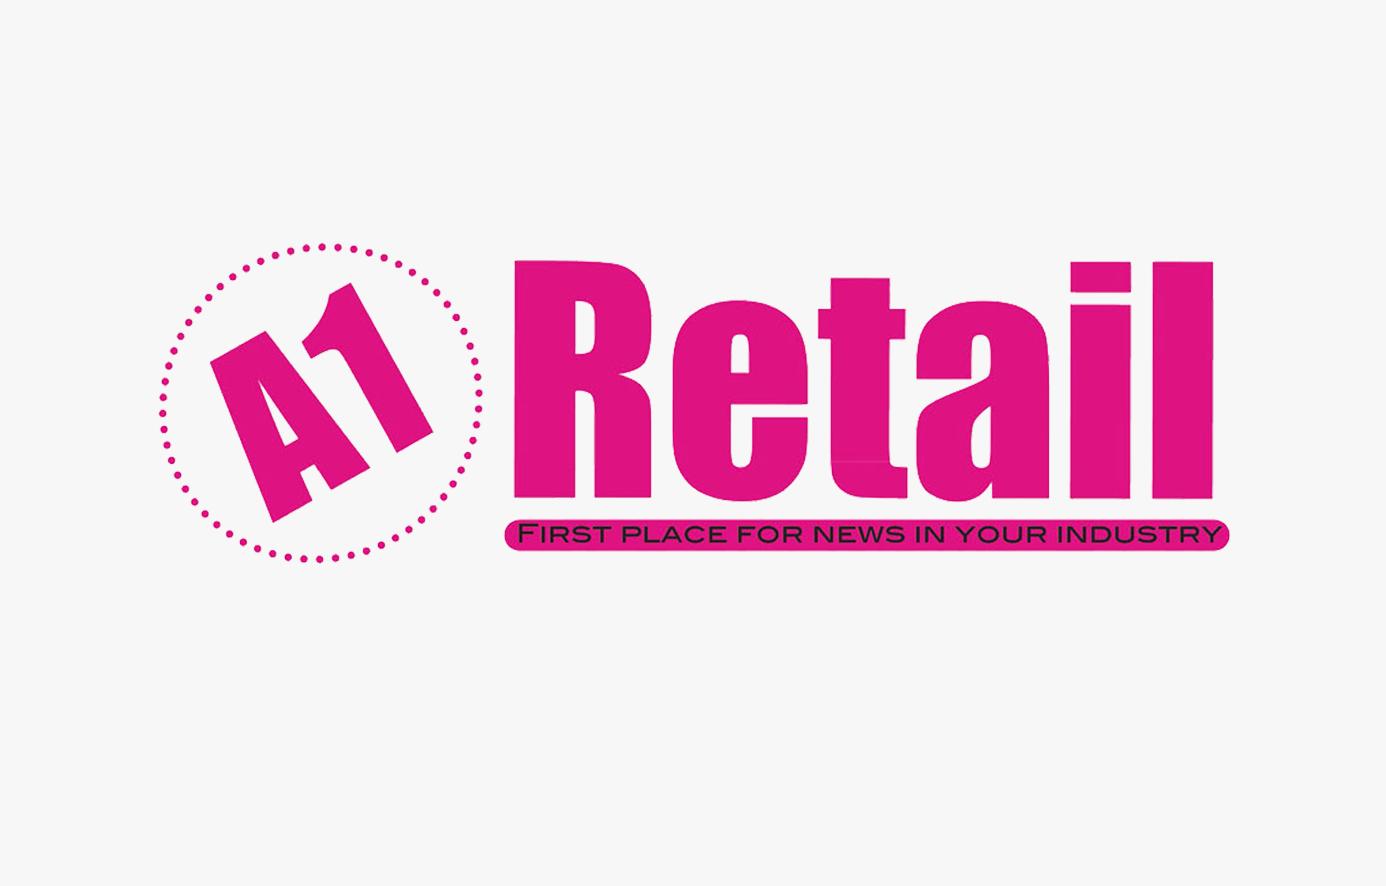 A1 Retail Magazine (Cover)